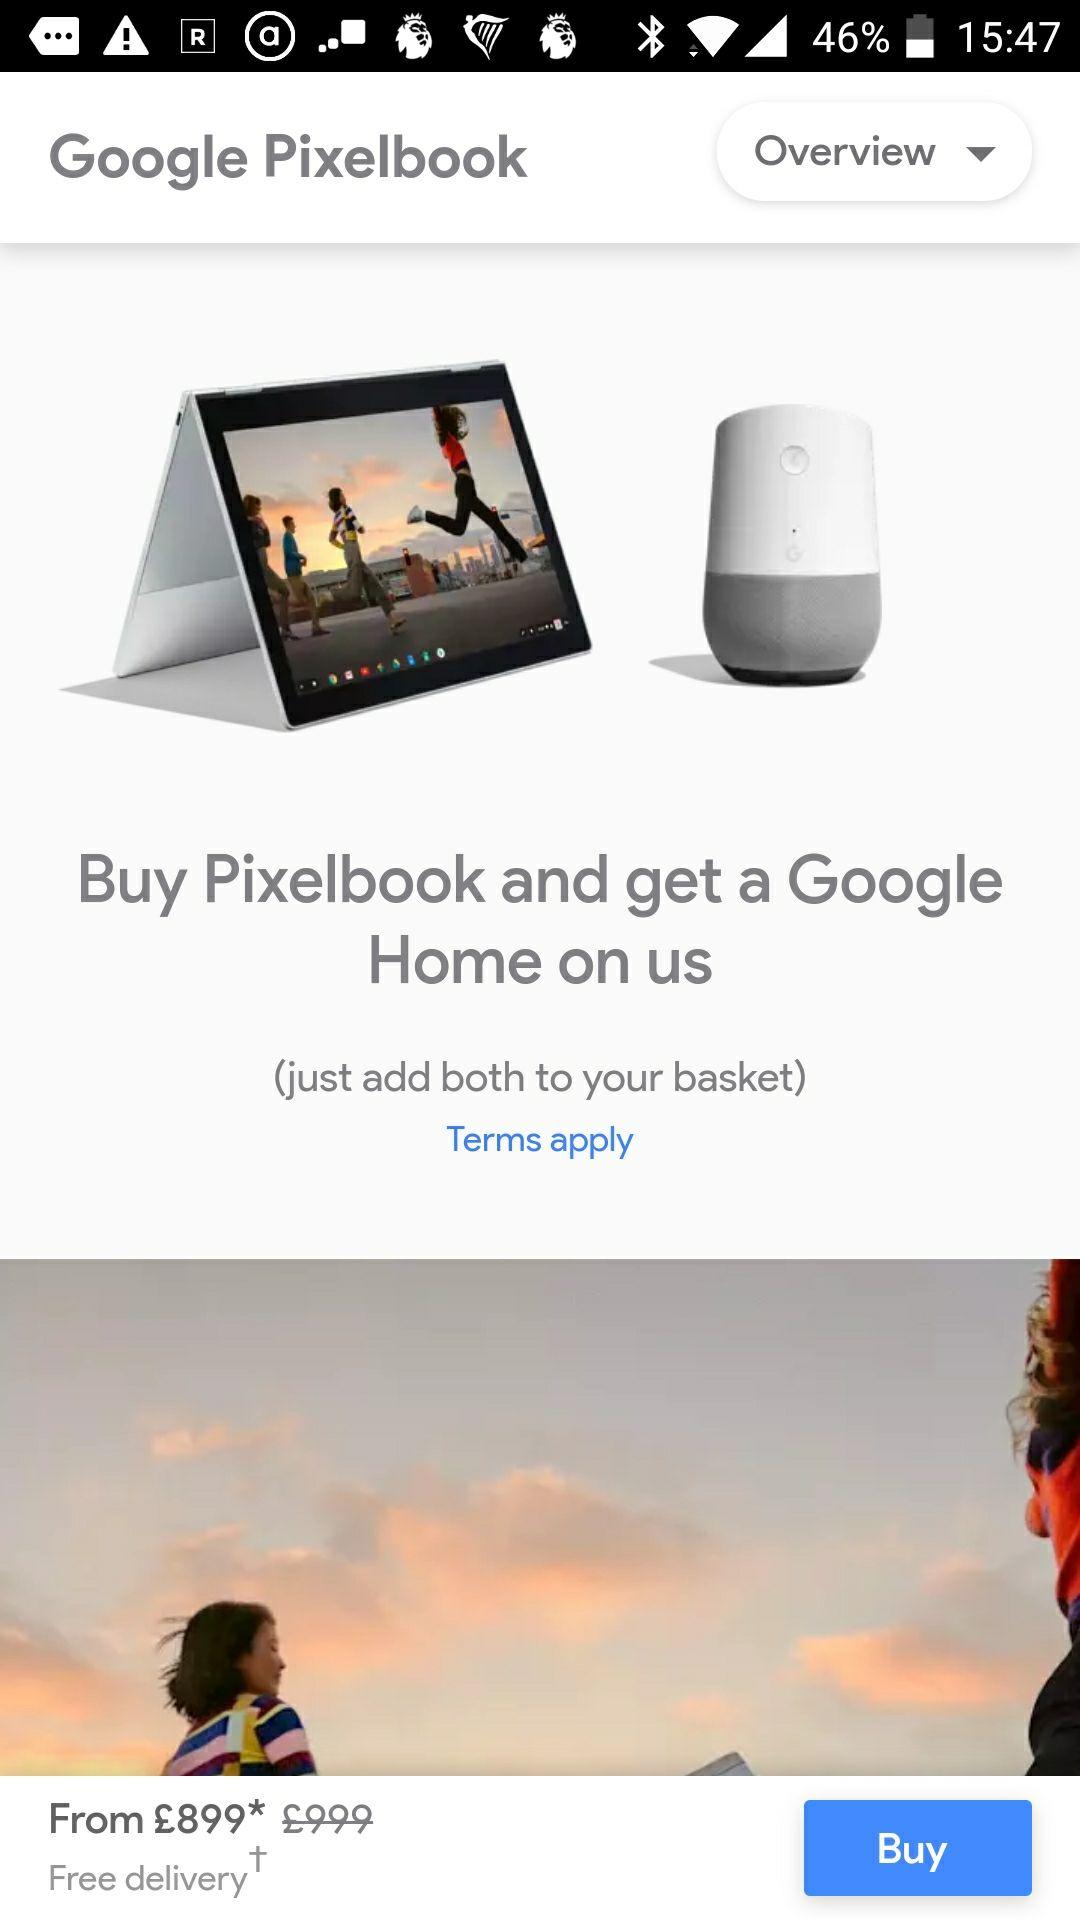 Google Pixelbook £899 @ Google store